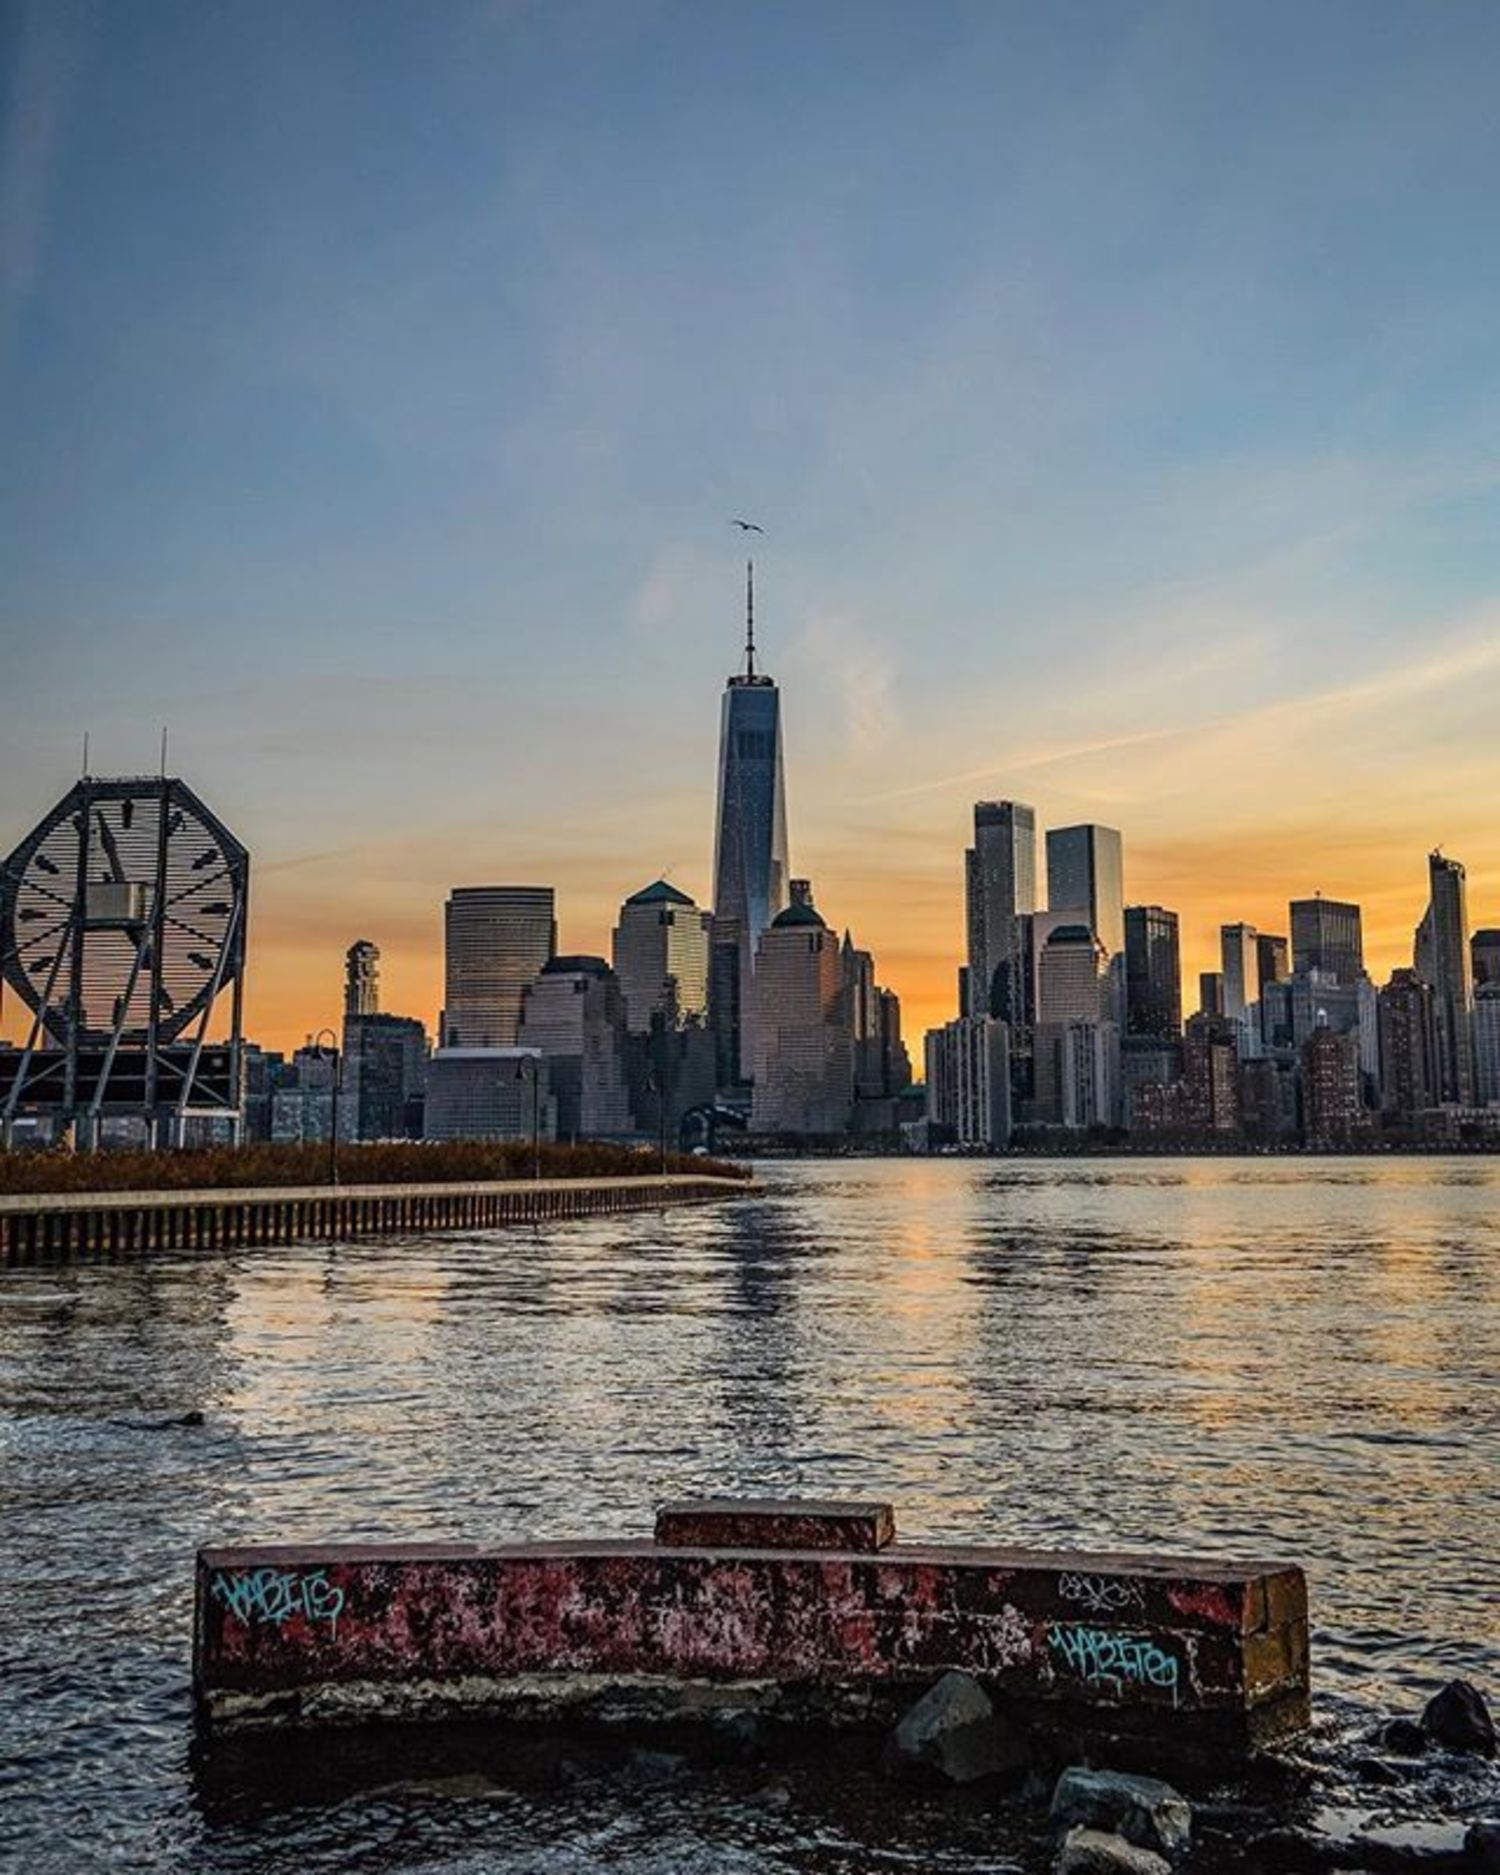 New York, New York. Photo via @eyecatchingphoto #viewingnyc #newyork #newyorkcity #nyc  #sunset